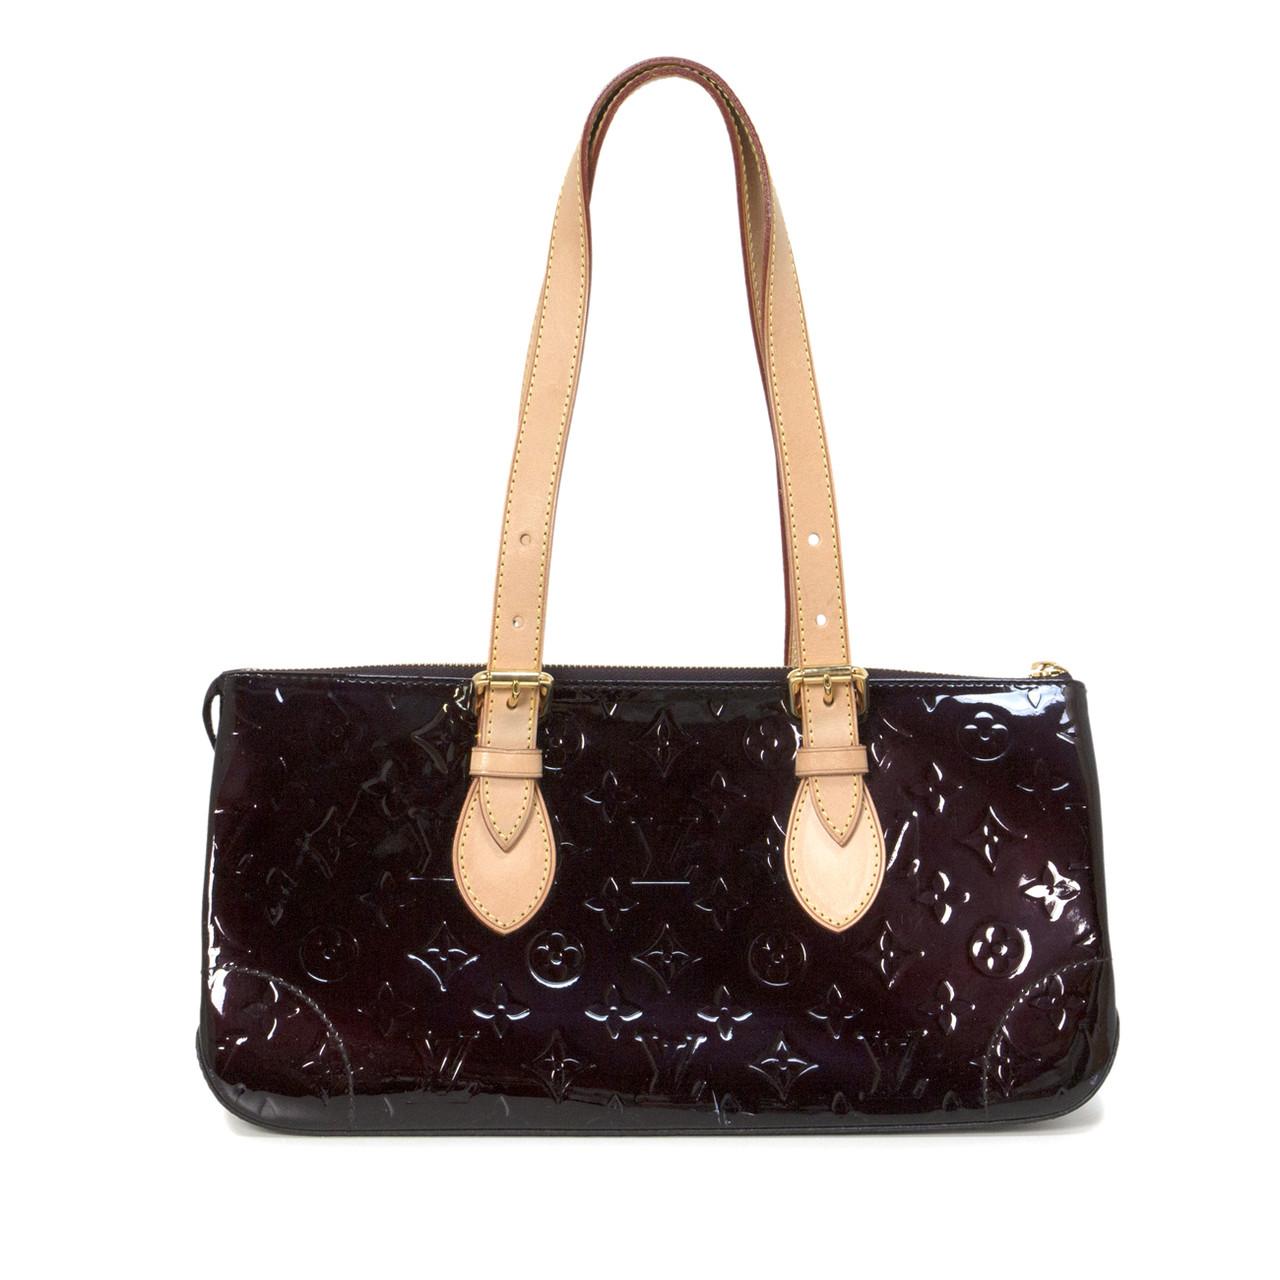 b9cb2cf23985 Louis Vuitton Amarante Vernis Rosewood Avenue - modaselle